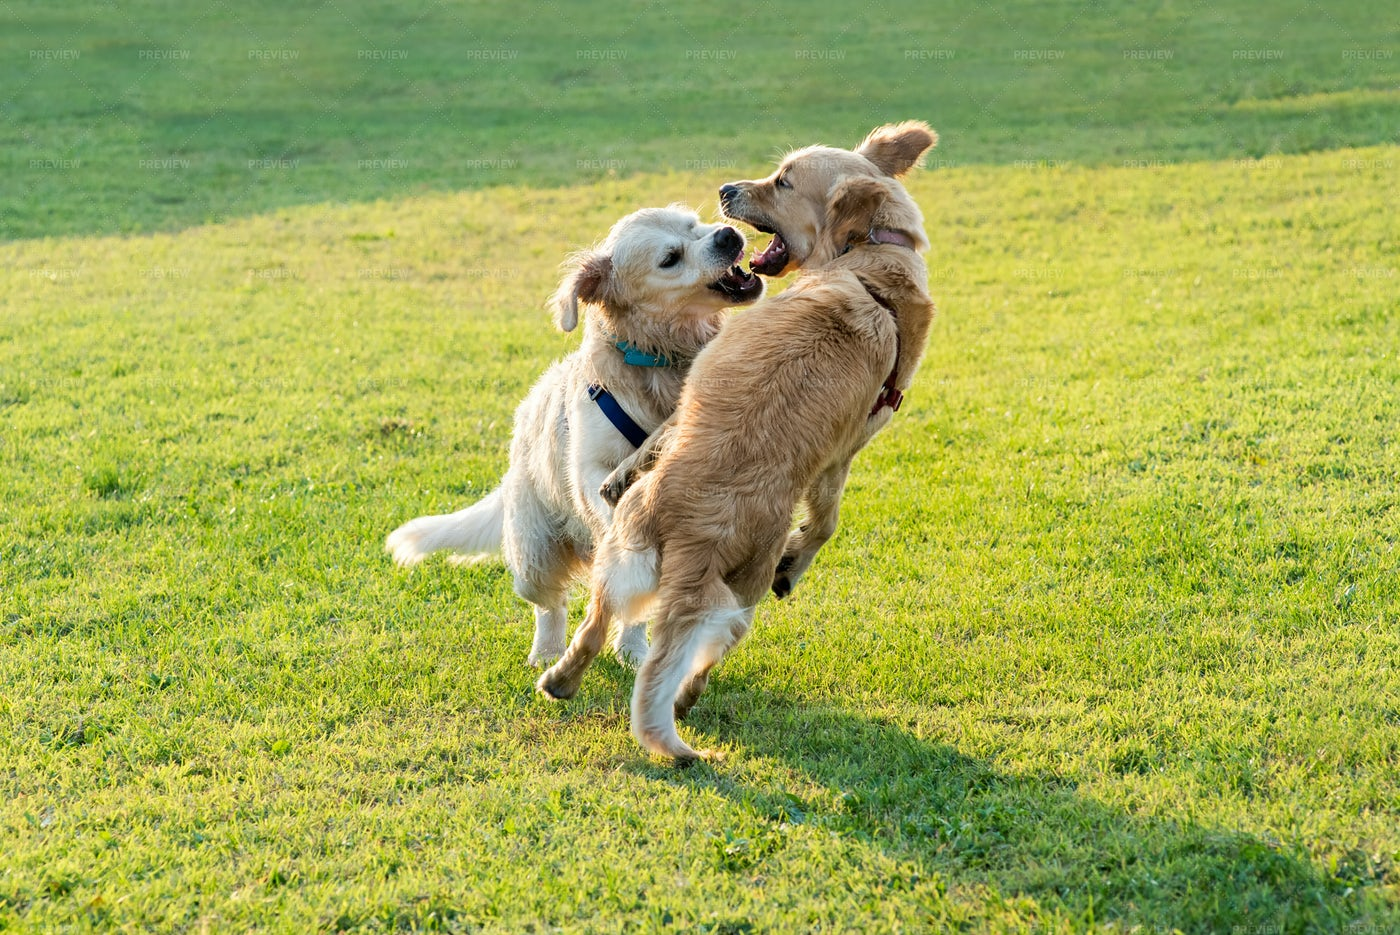 Golden Retriever Dogs Playing: Stock Photos